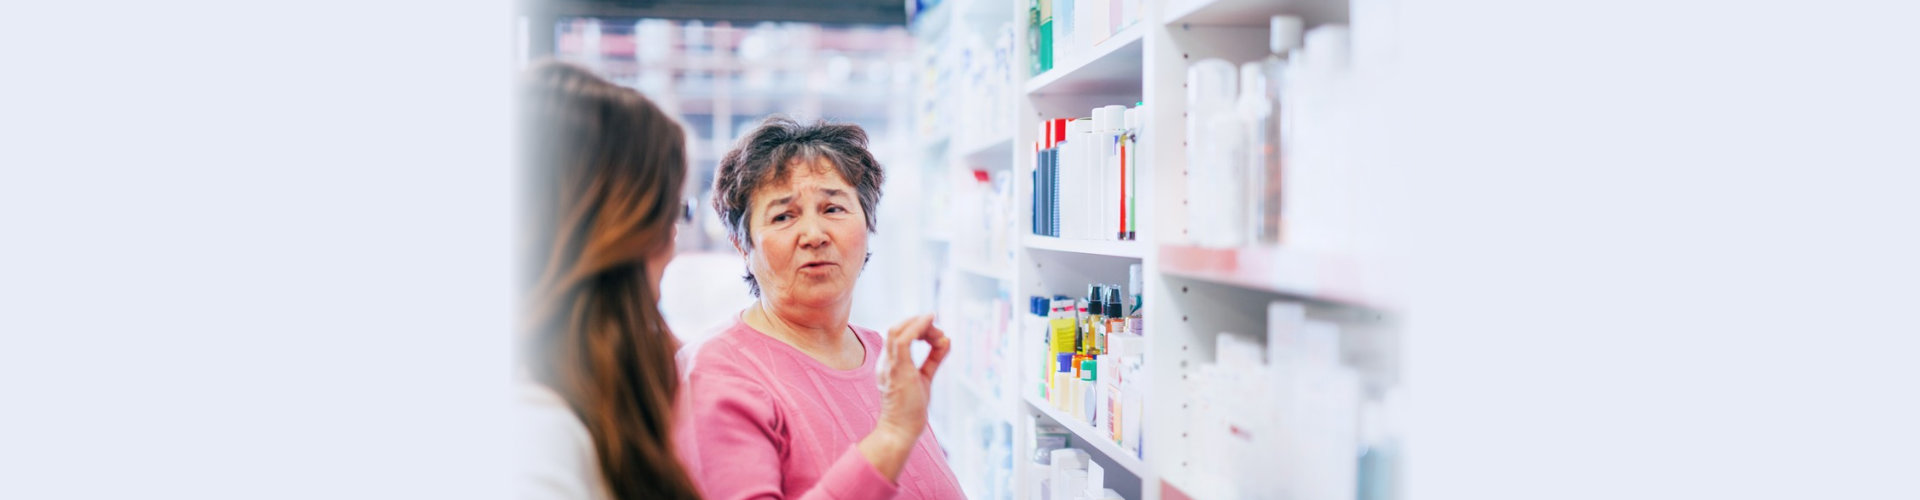 senior buying some medicines